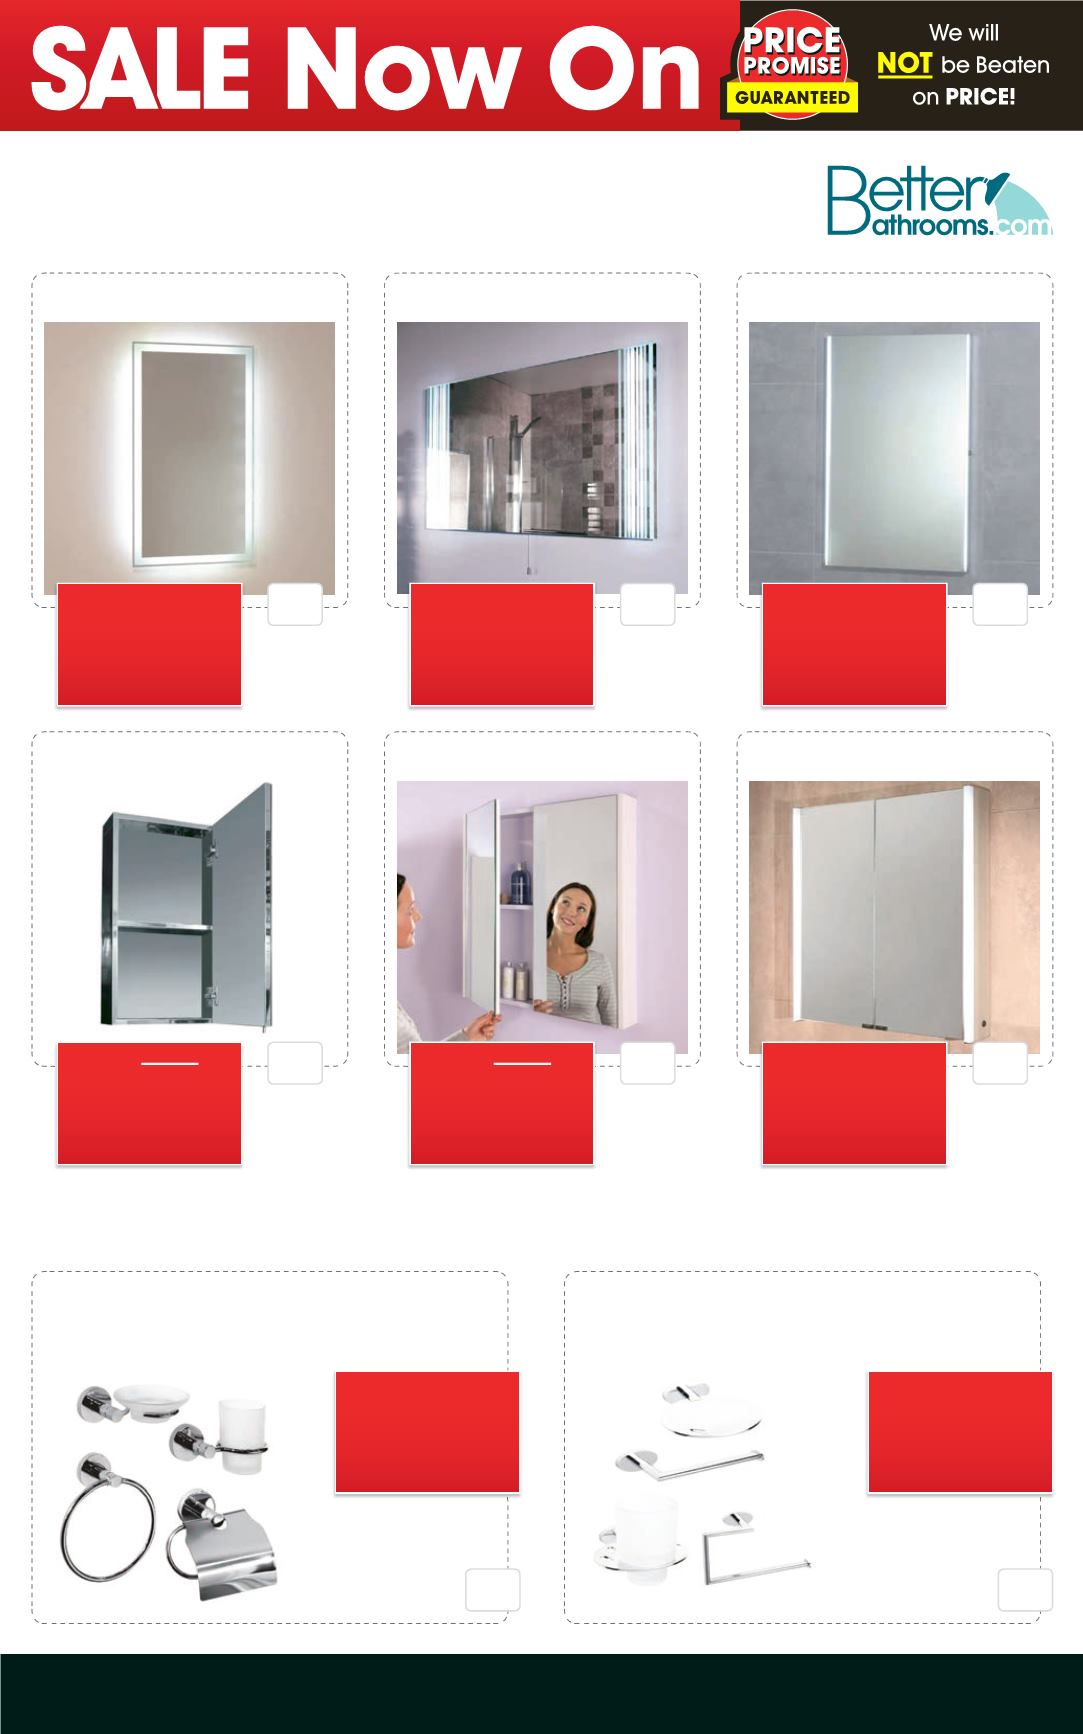 Better bathrooms sale - Better Bathrooms April Showers Sale Deal Sheet Page 9